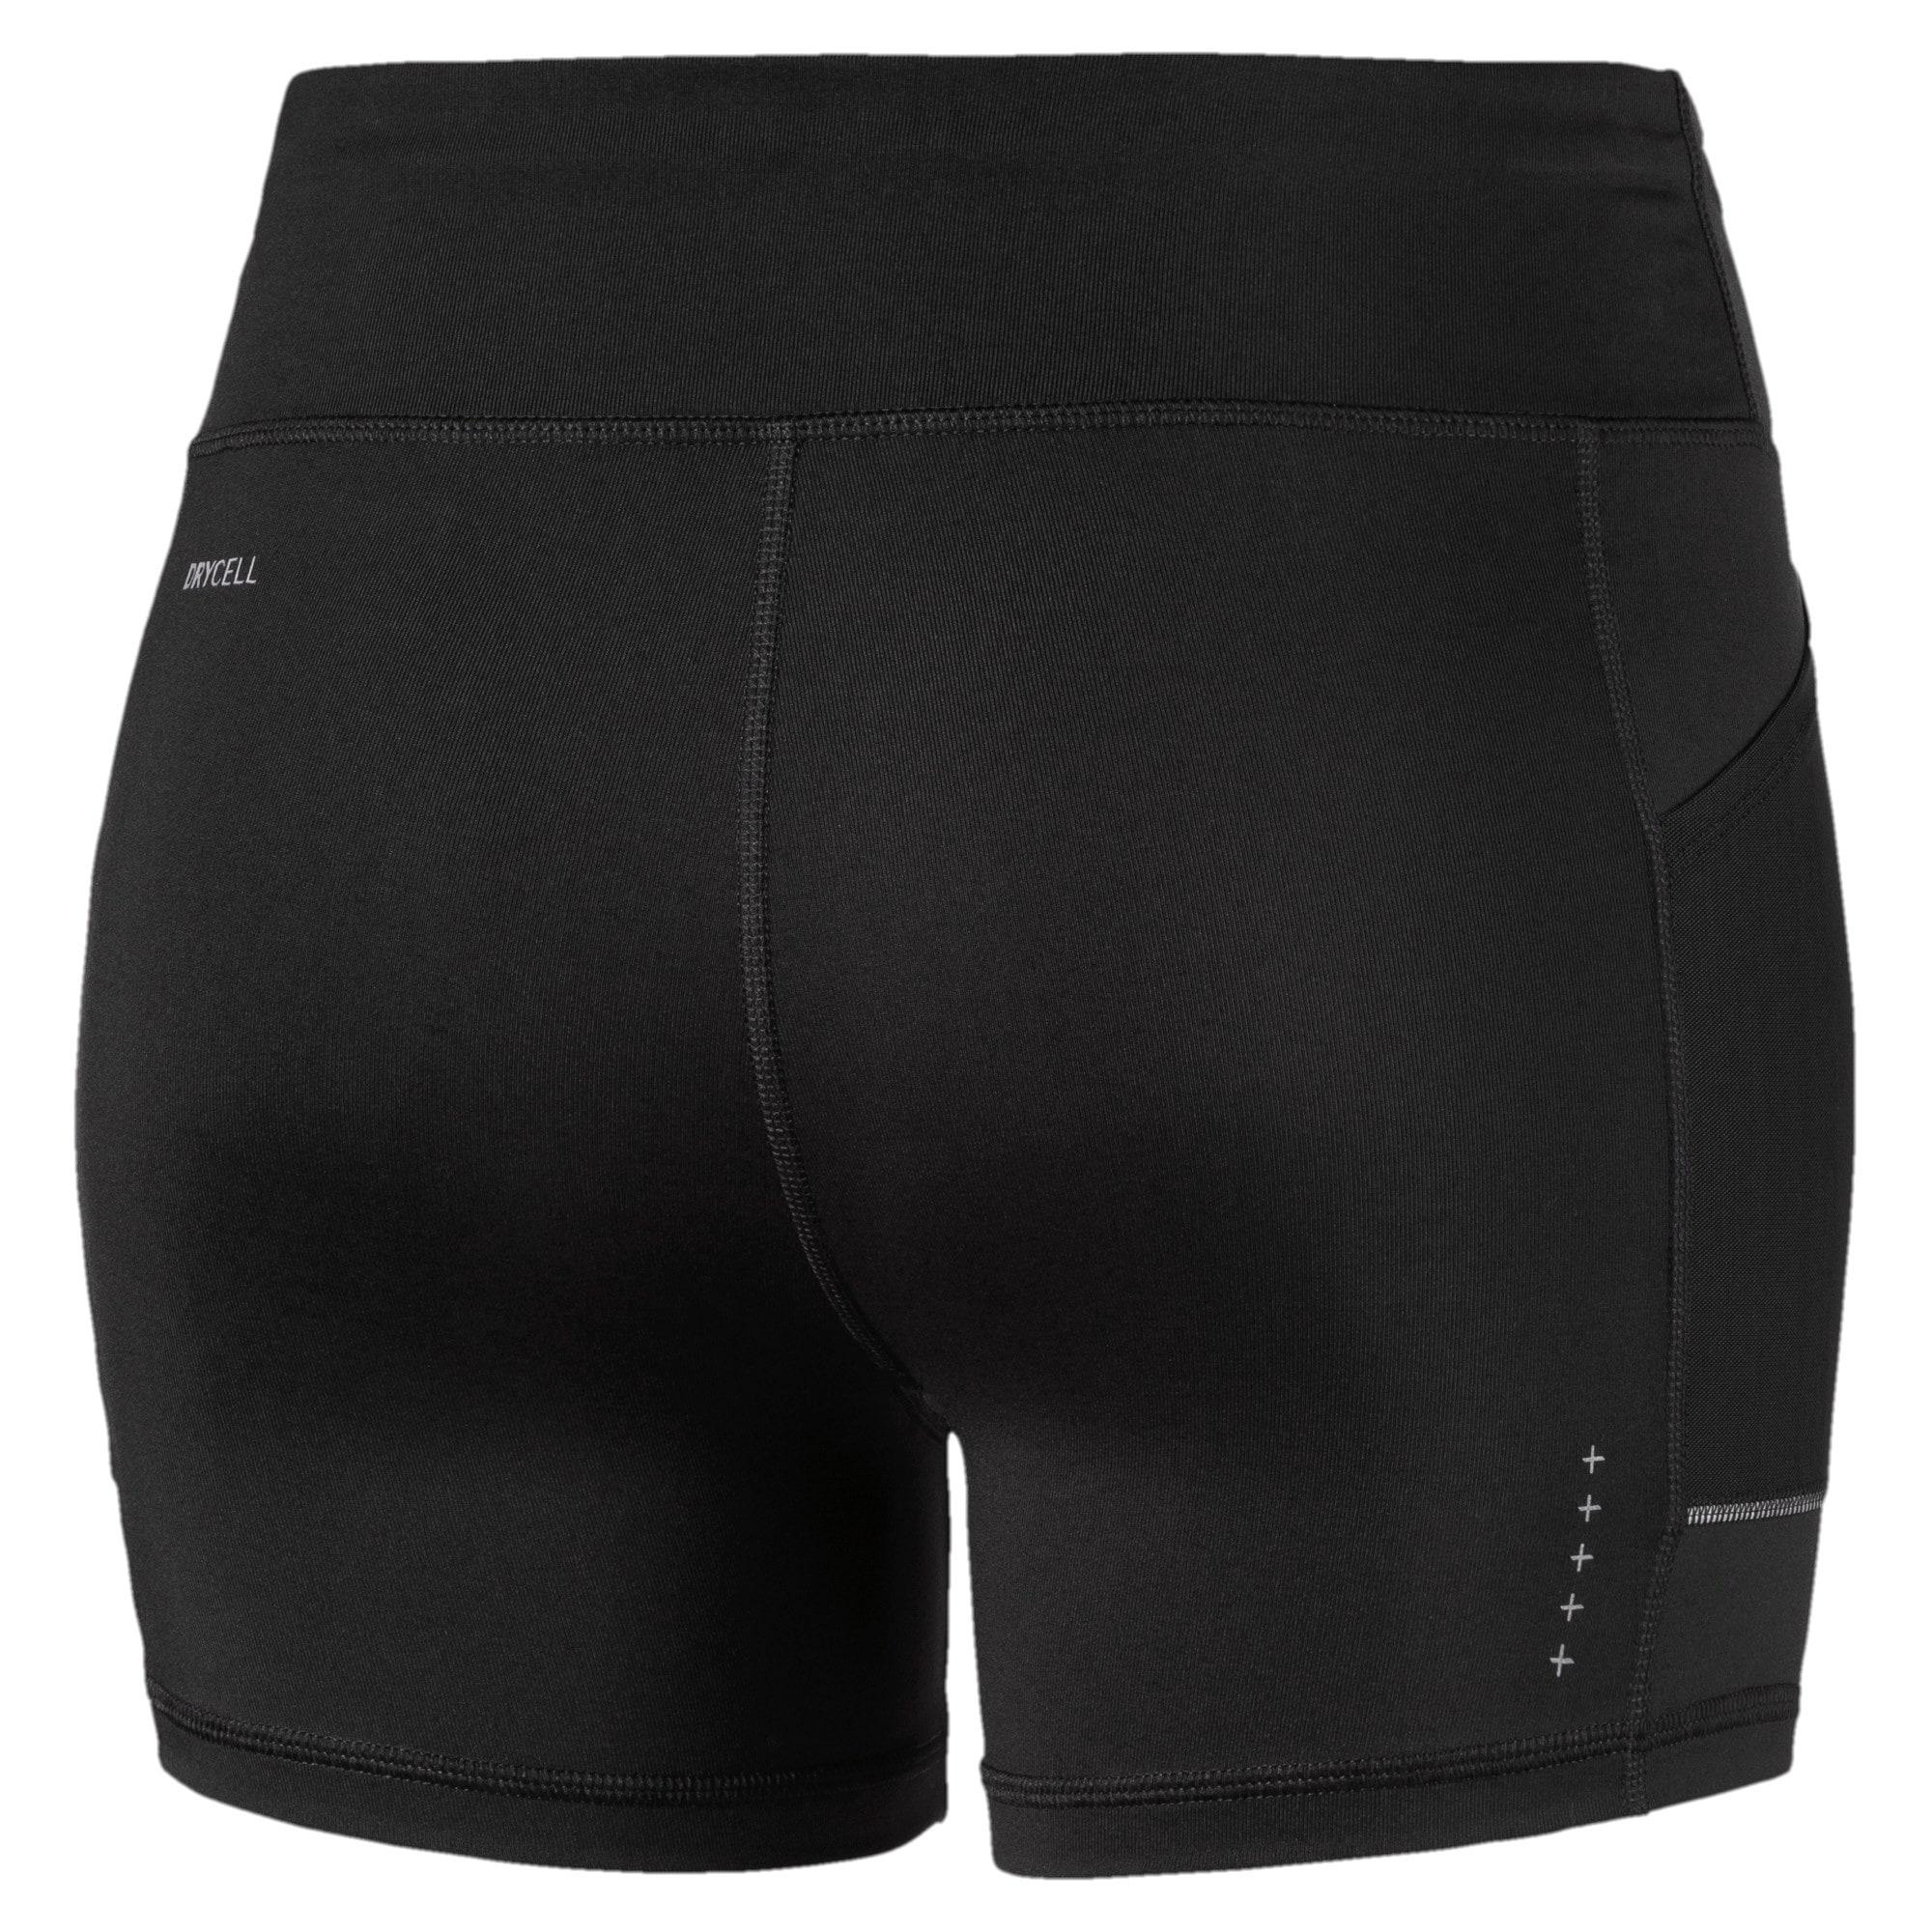 Miniatura 5 de Calzas cortas Ignite para mujer, Puma Black, mediano